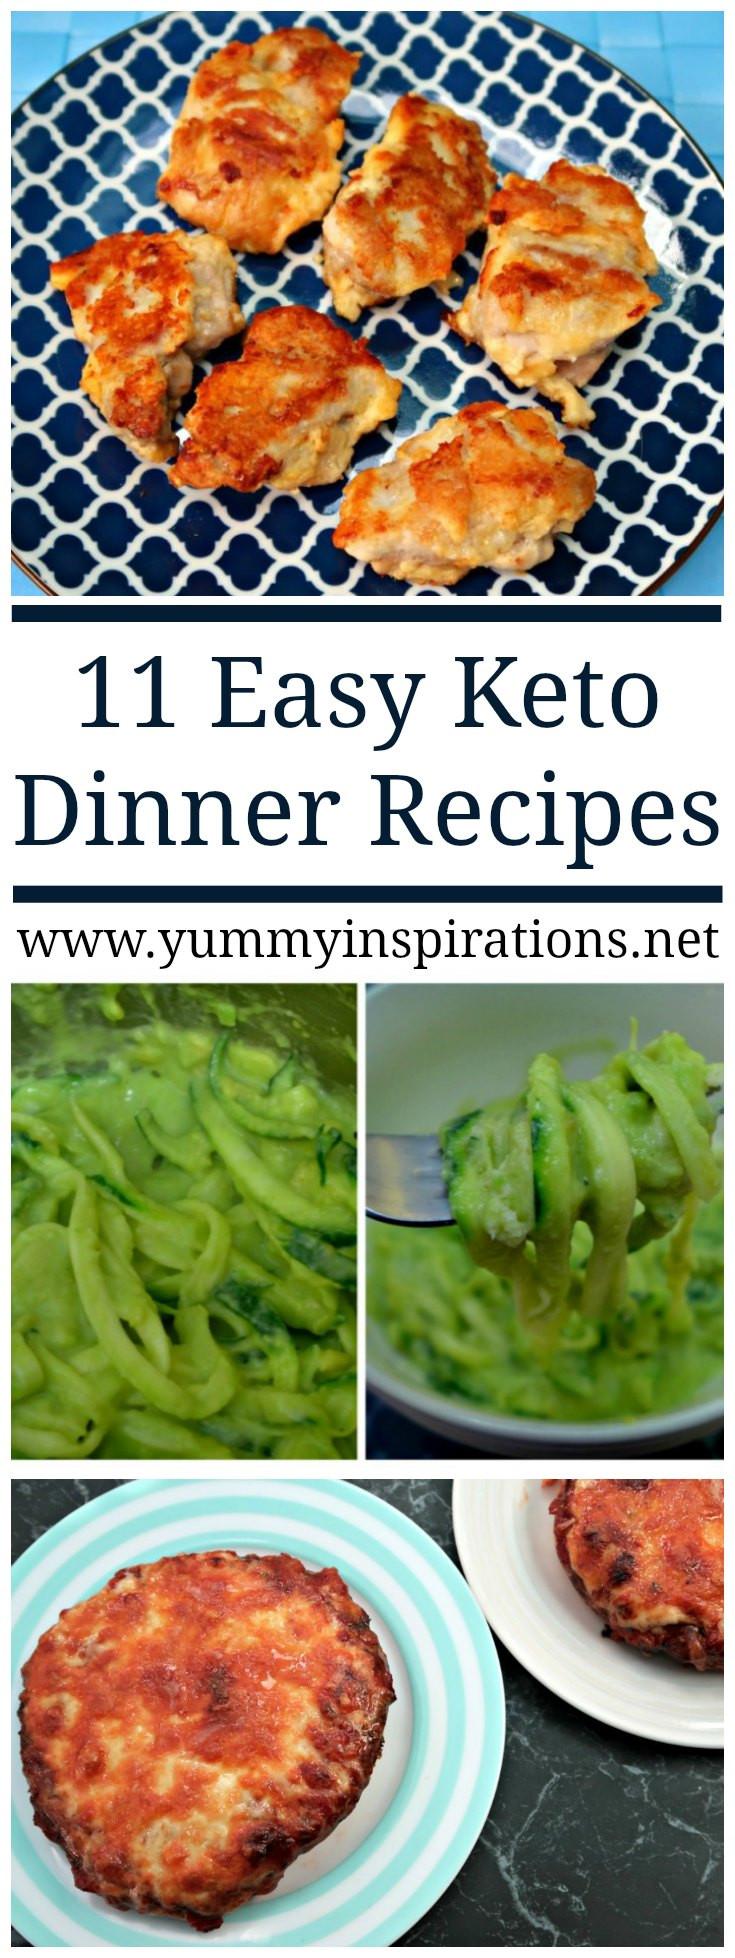 Keto Diet Dinner Recipes  11 Easy Keto Dinner Recipes Quick Low Carb Ketogenic